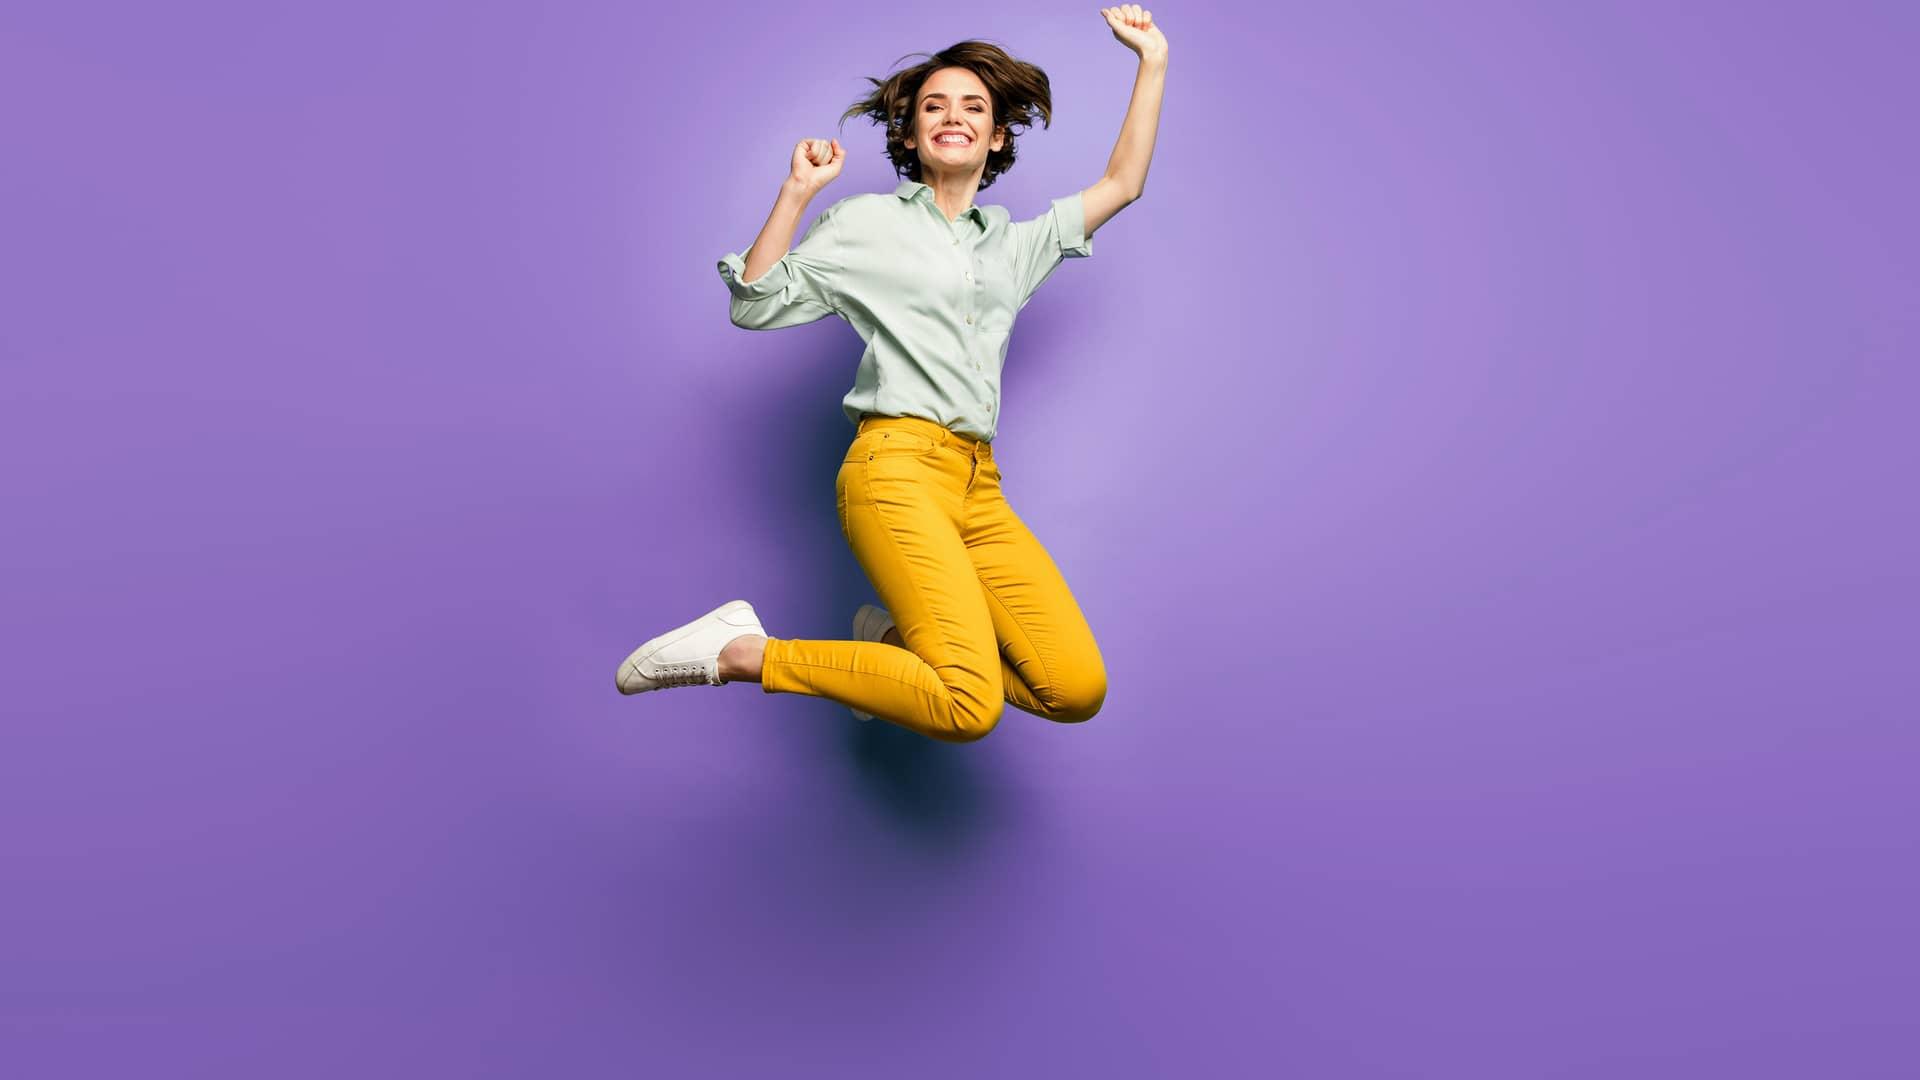 Mujer saltando simboliza portabilidad de llamaya